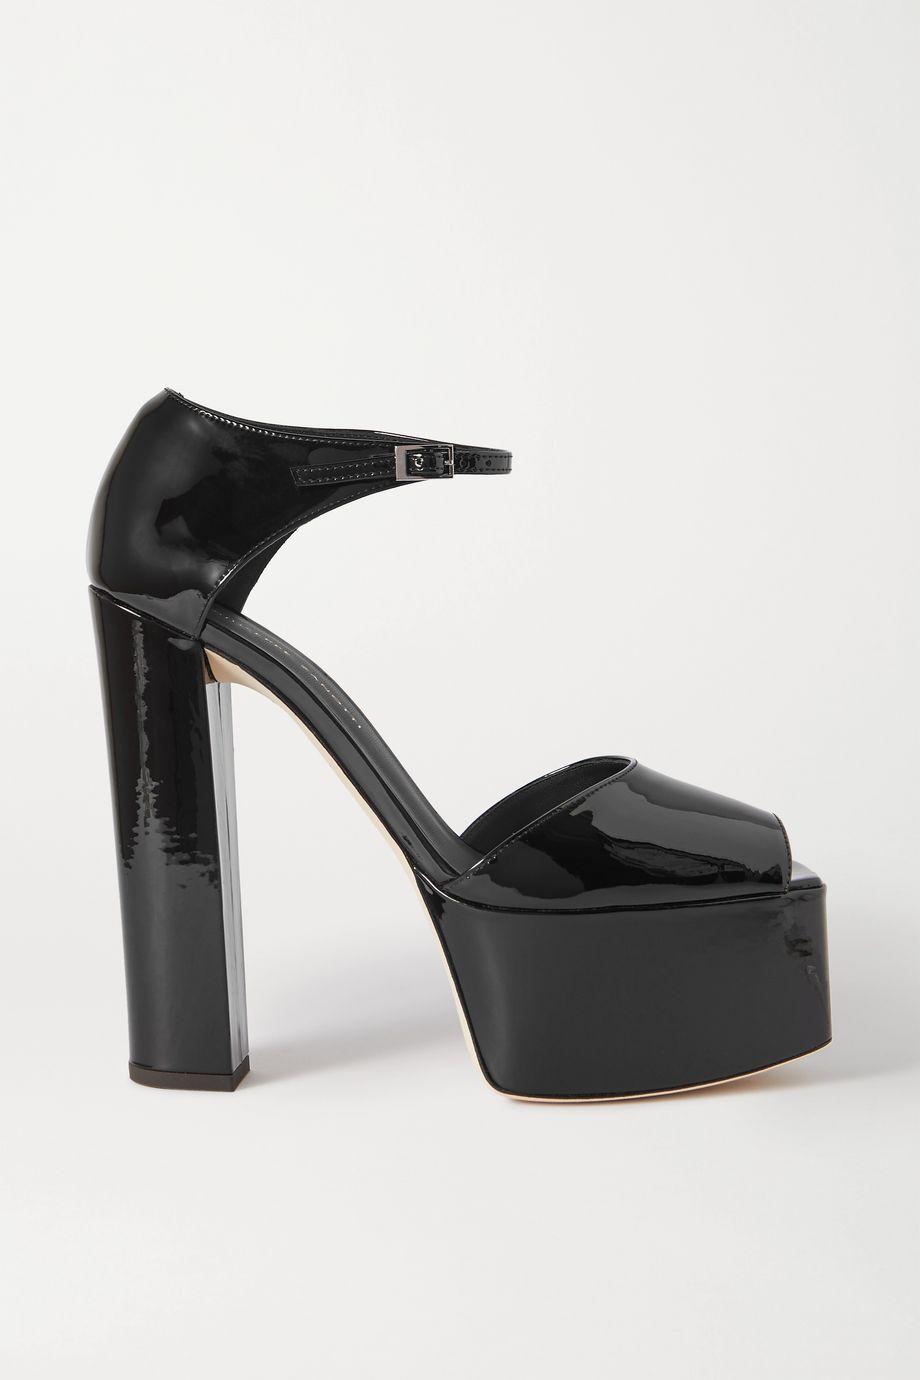 Giuseppe Zanotti Patent-leather platform sandals